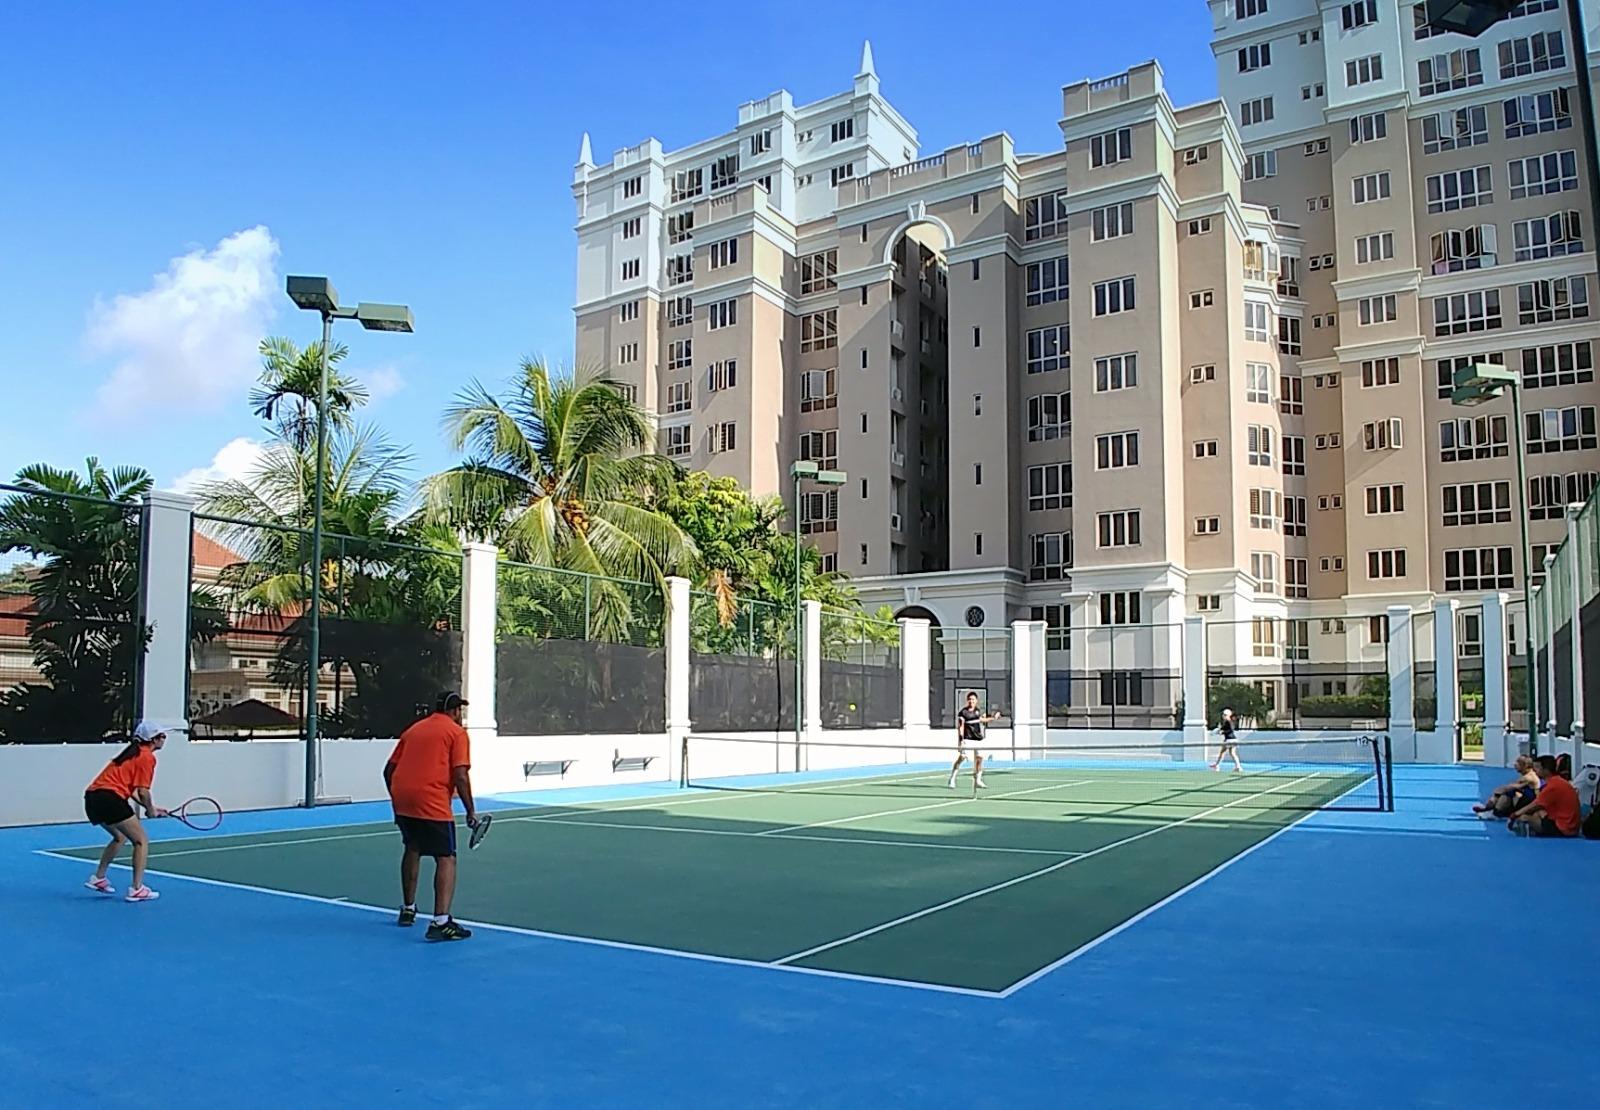 castle green tennis court